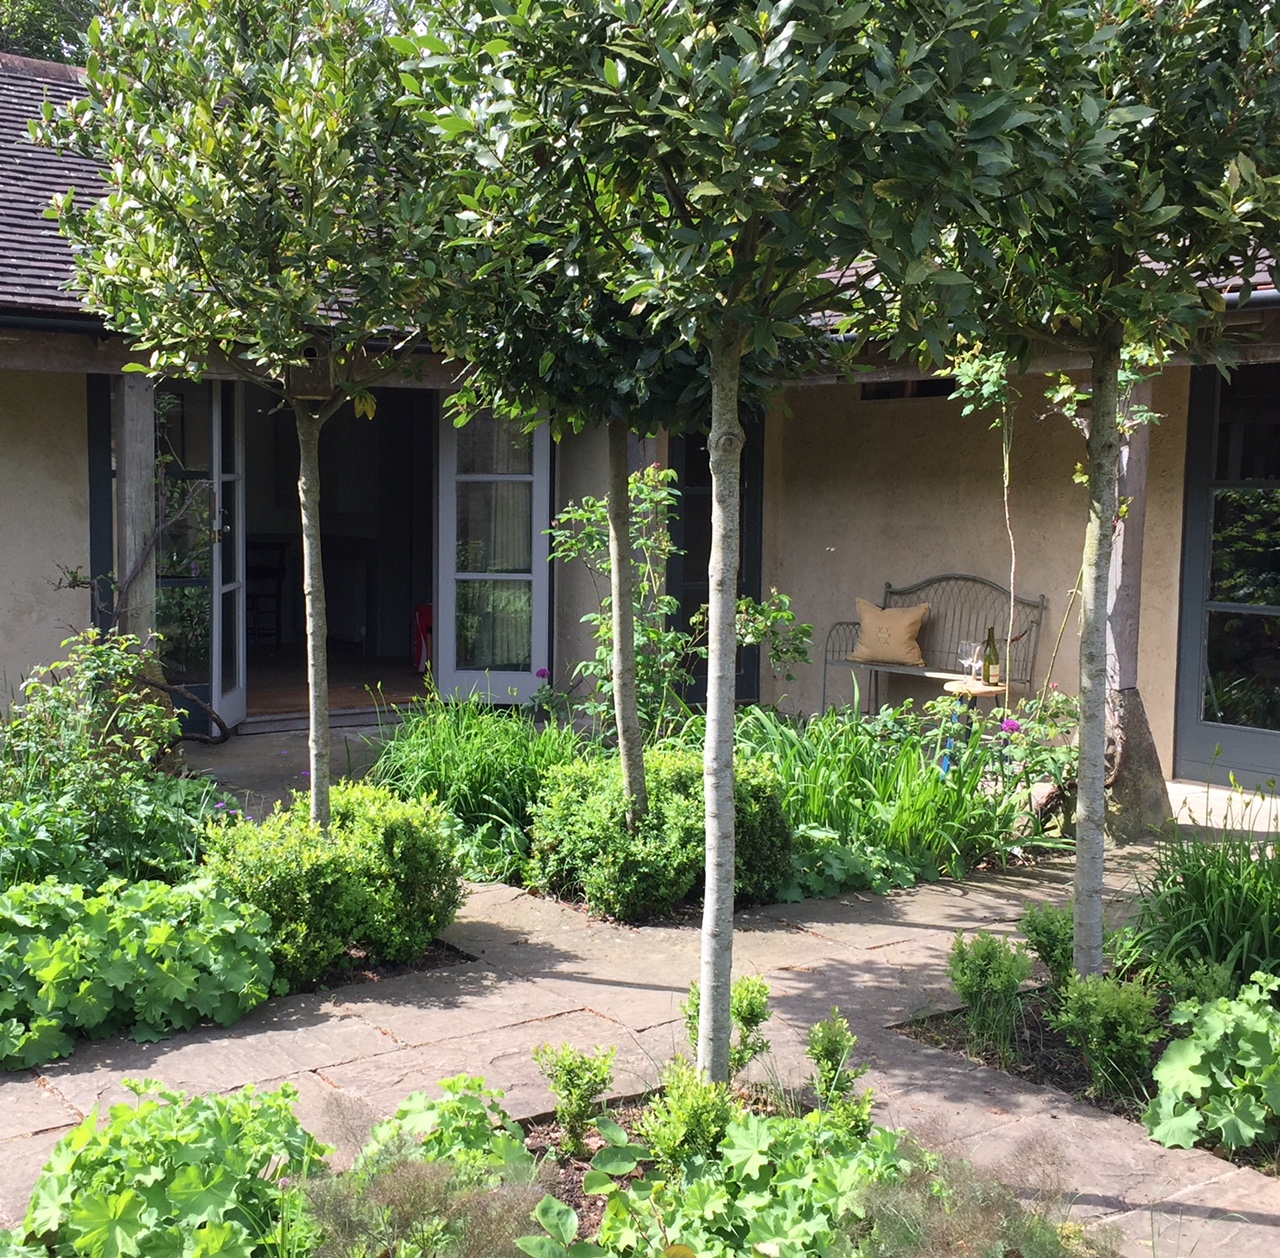 - French doors open onto courtyard garden